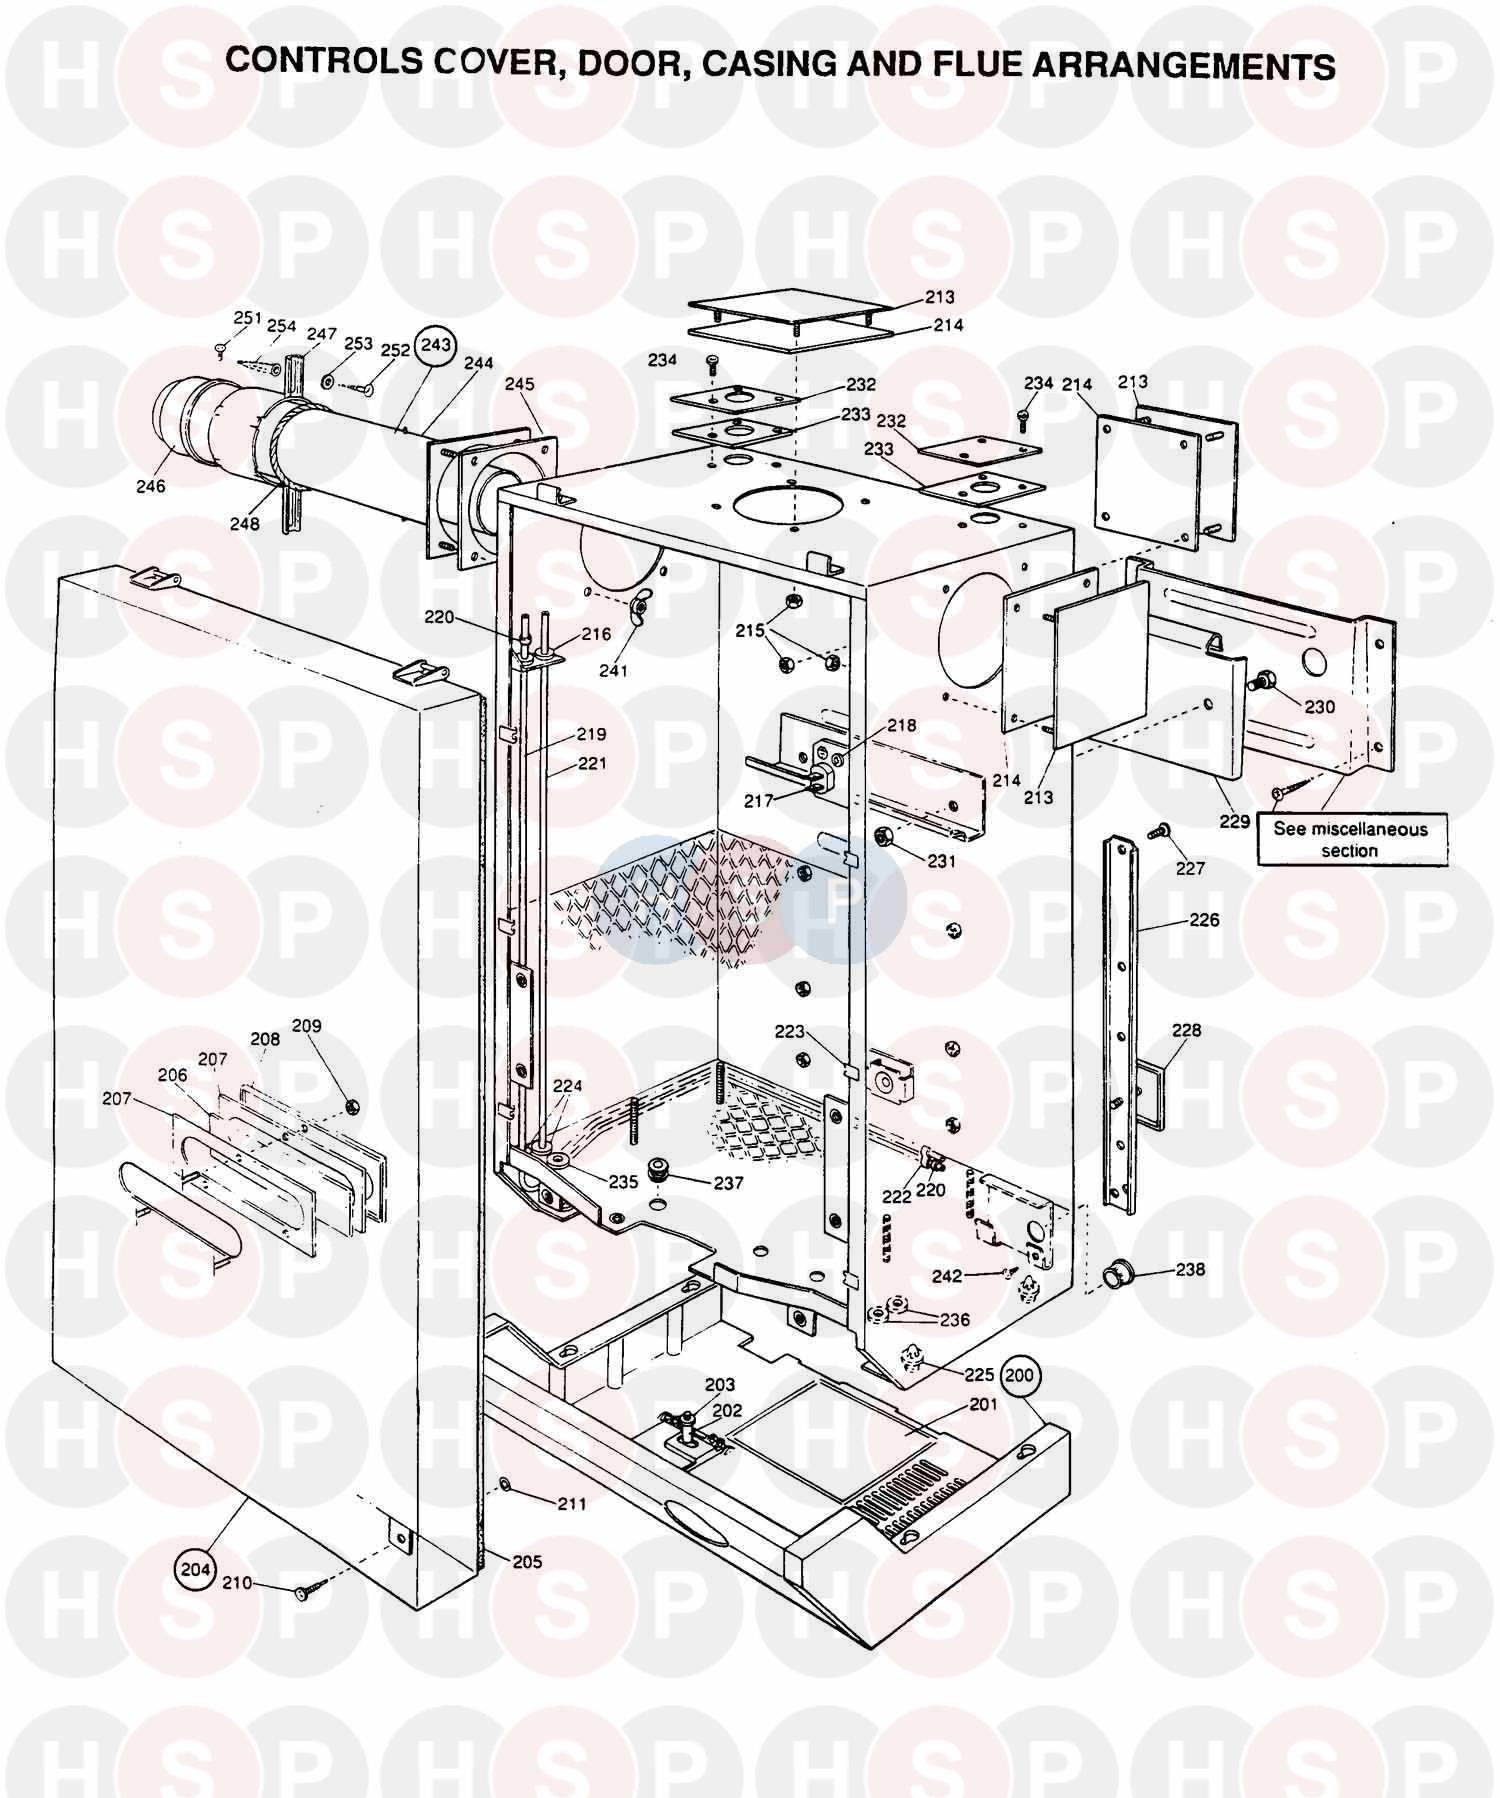 Potterton BRITISH GAS 80 F2 (Controls Cover/Door/Casing